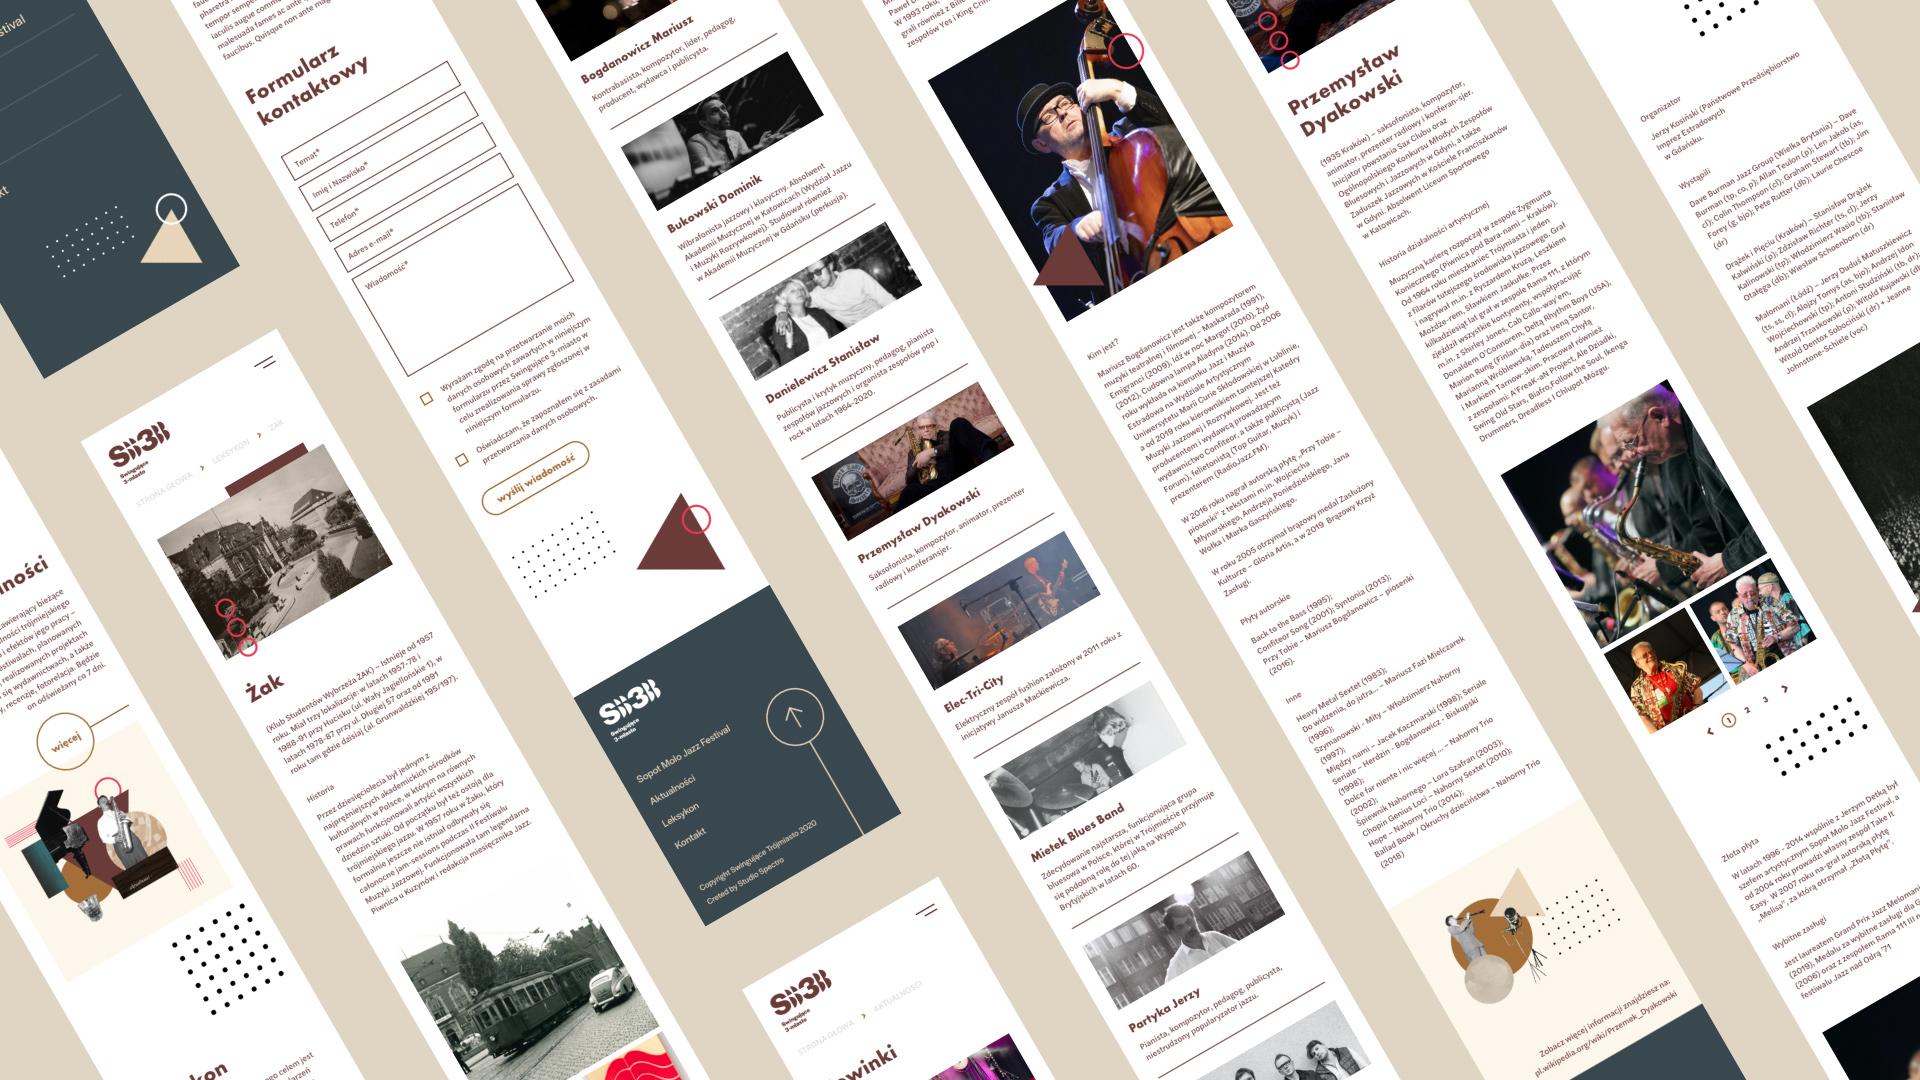 www design responsywna UX/UI Gdansk studio spectro